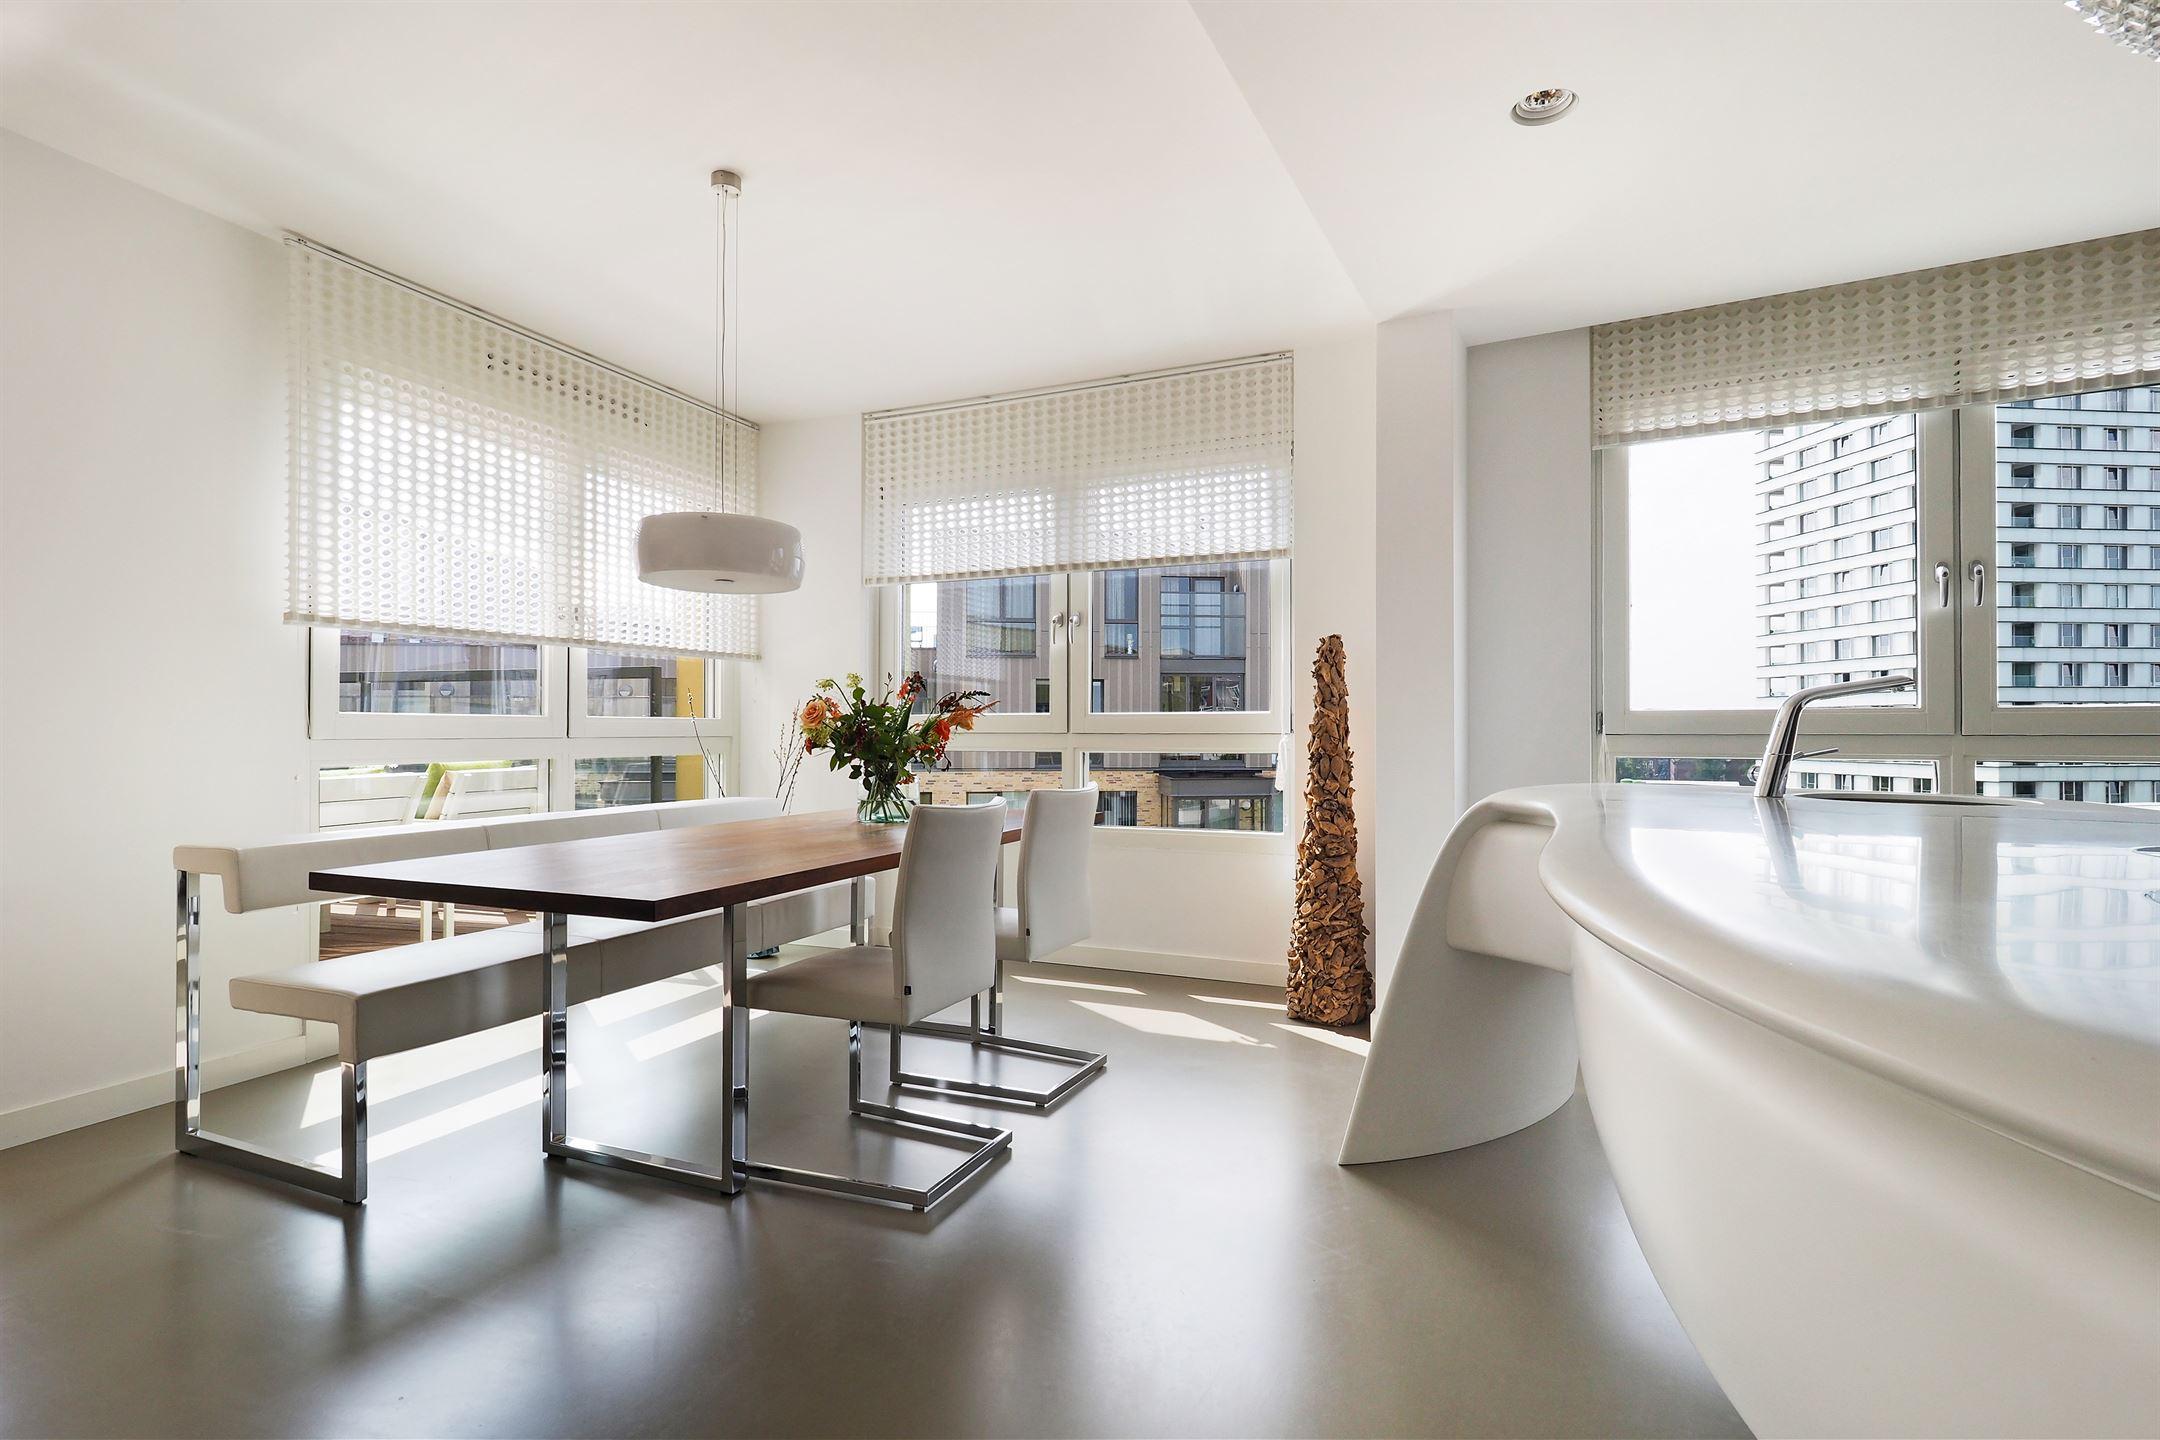 Appartement te koop: spiegeltuin 59 5223 mz den bosch [funda]